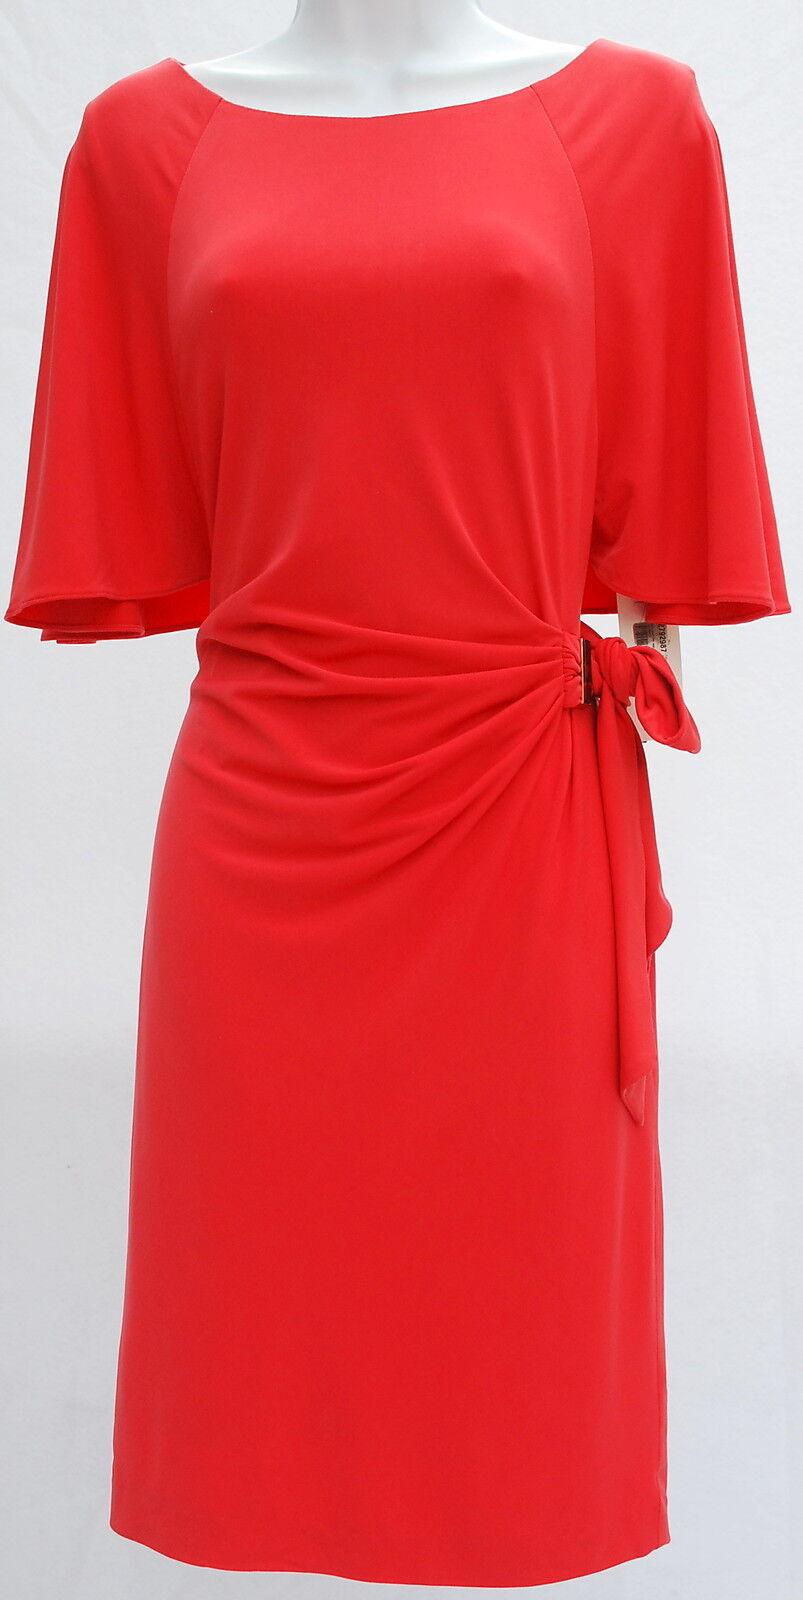 TAHARI waist tie coral cocktail occasion elegant classy damen dress sz 10